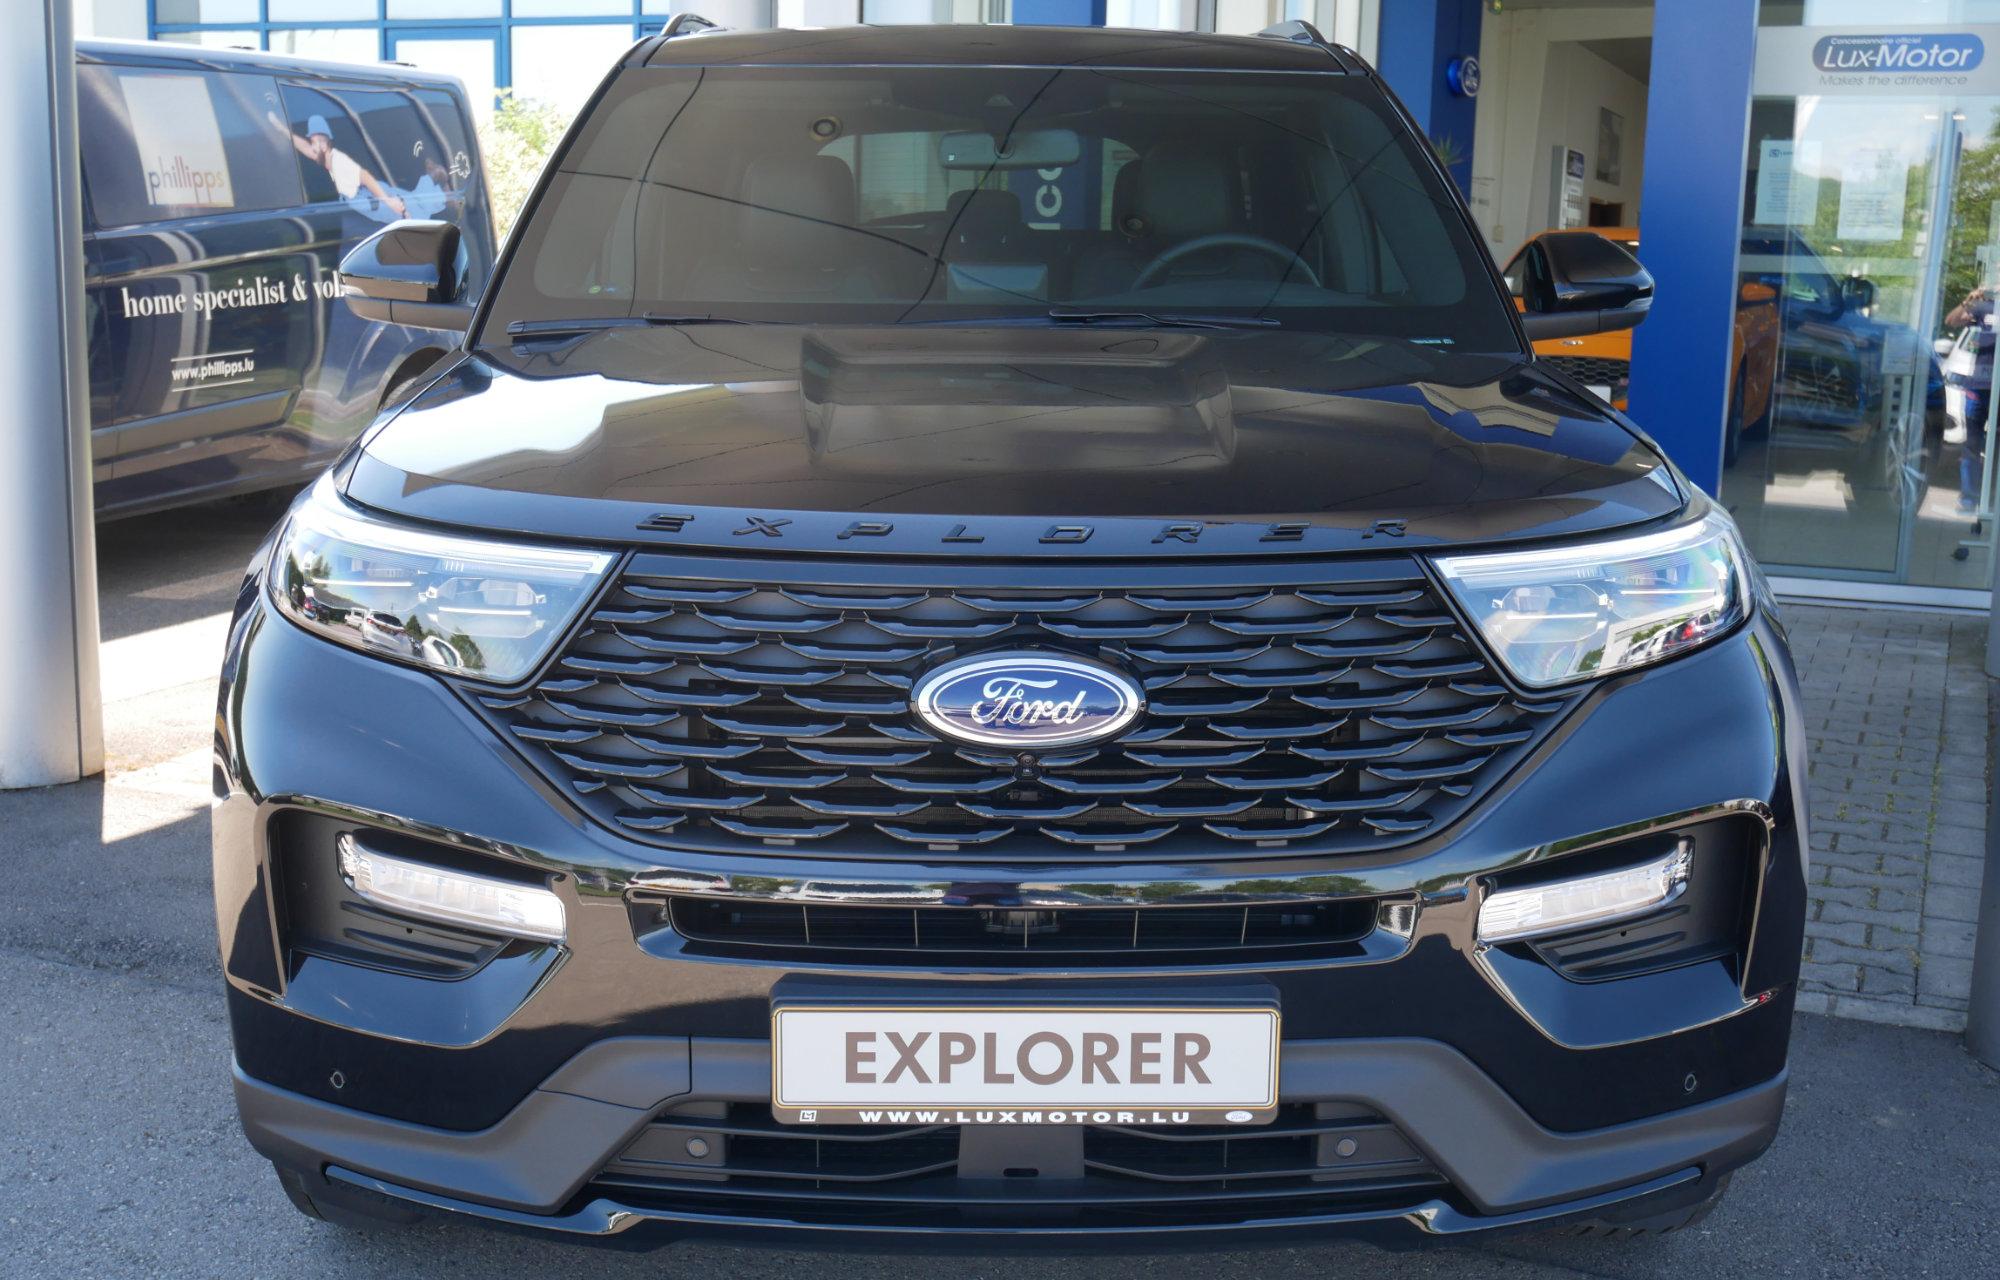 Ford Explorer LuxMotor